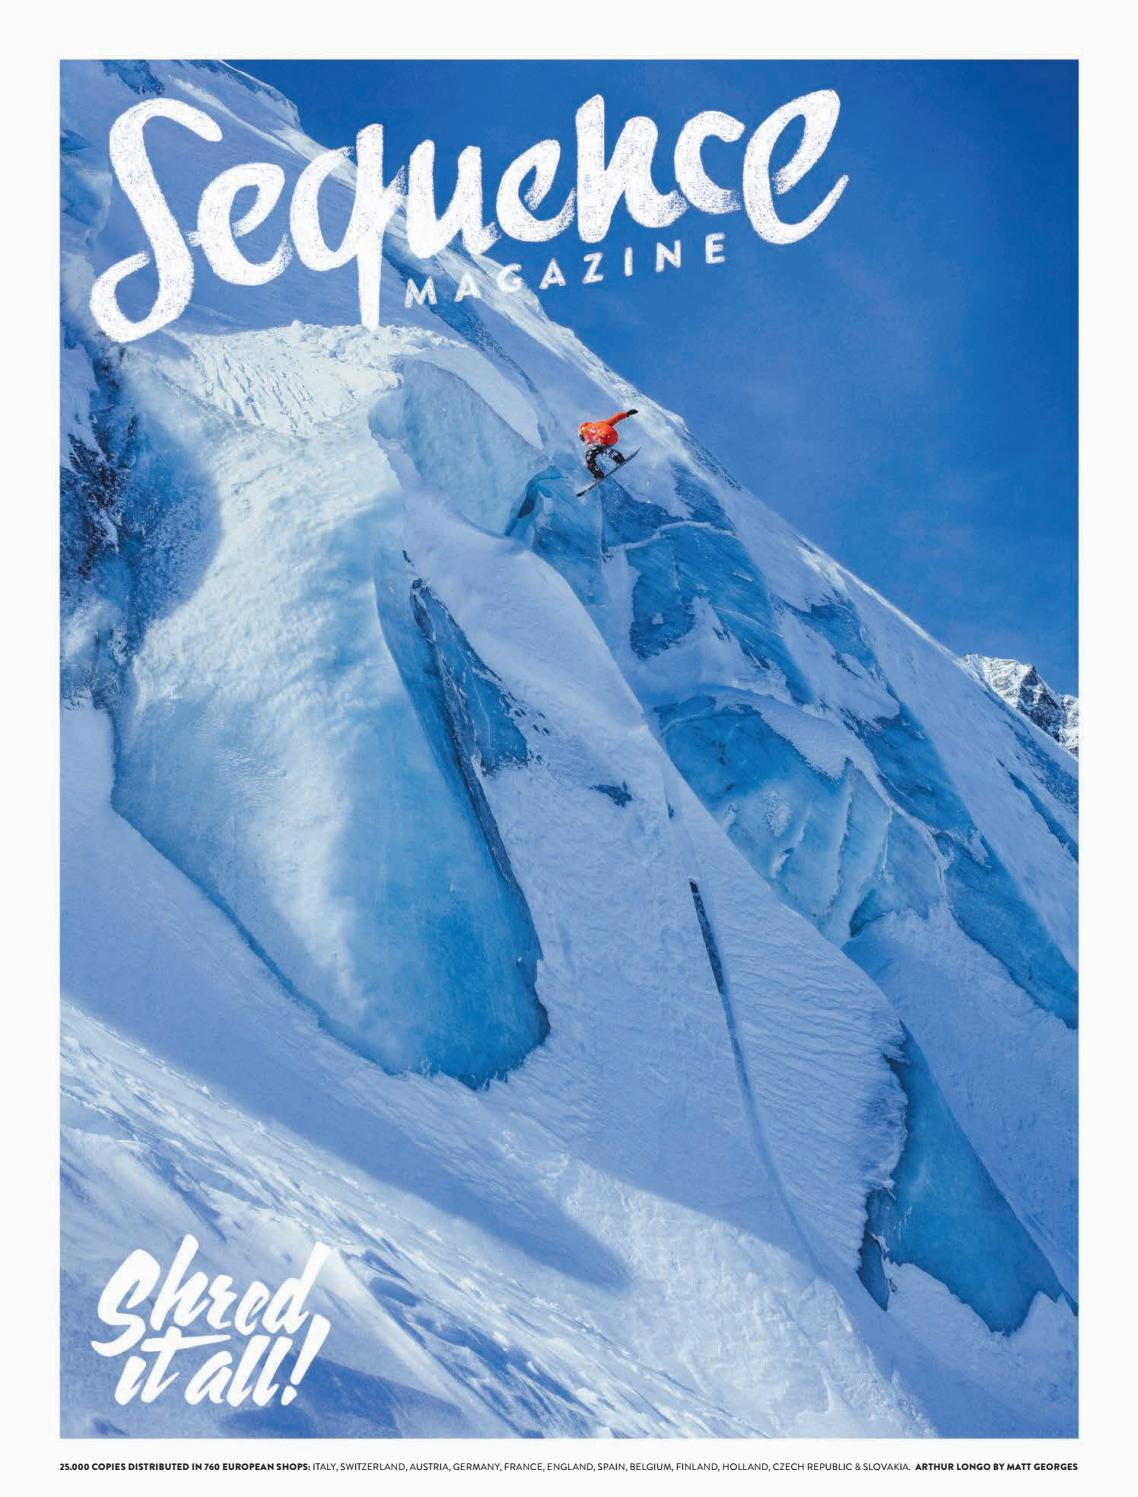 $399 Womens Medium Chugach Ski Bib Pants Goretex Recco Snowboard Blue Storm 3